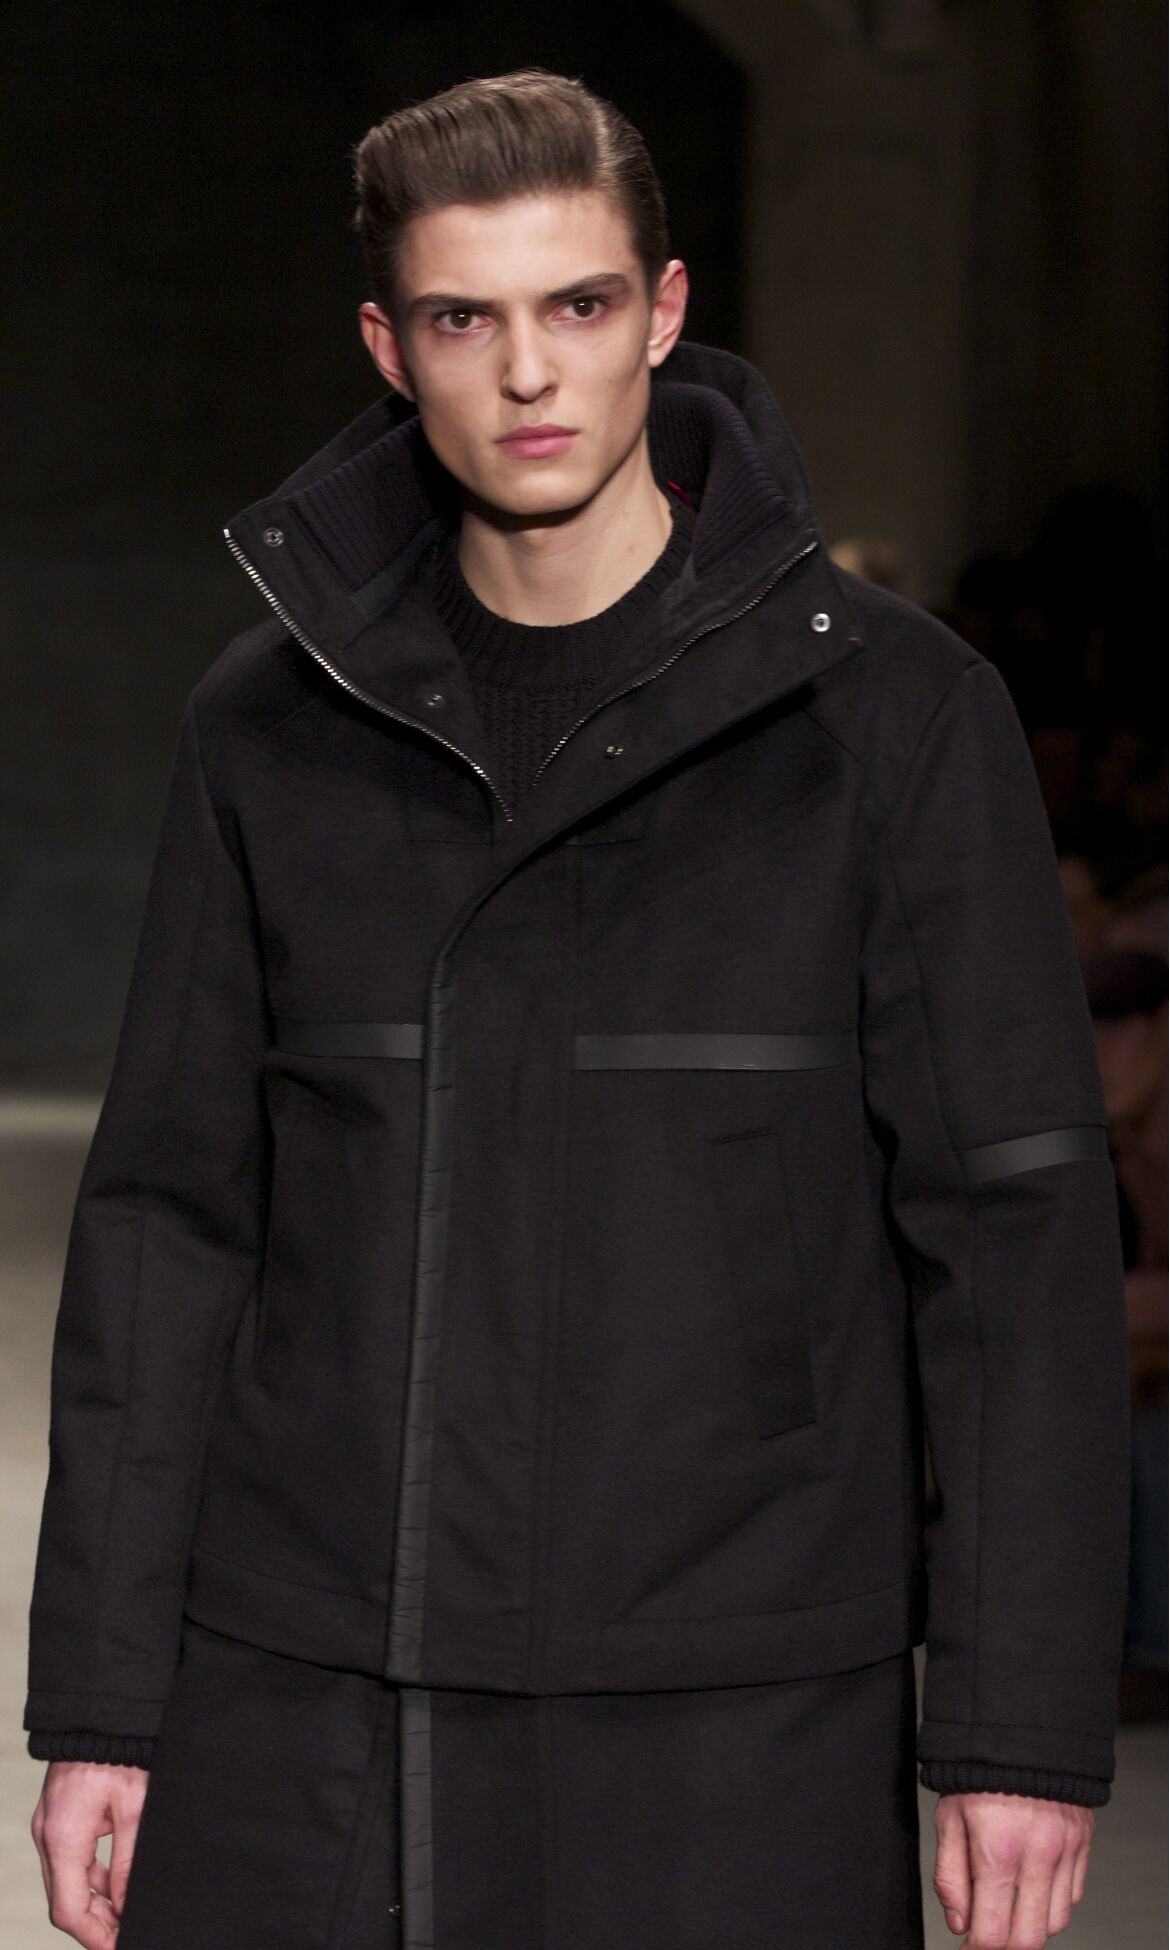 Fall Winter 2013 14 Fashion Men's Collection Joseph Abboud